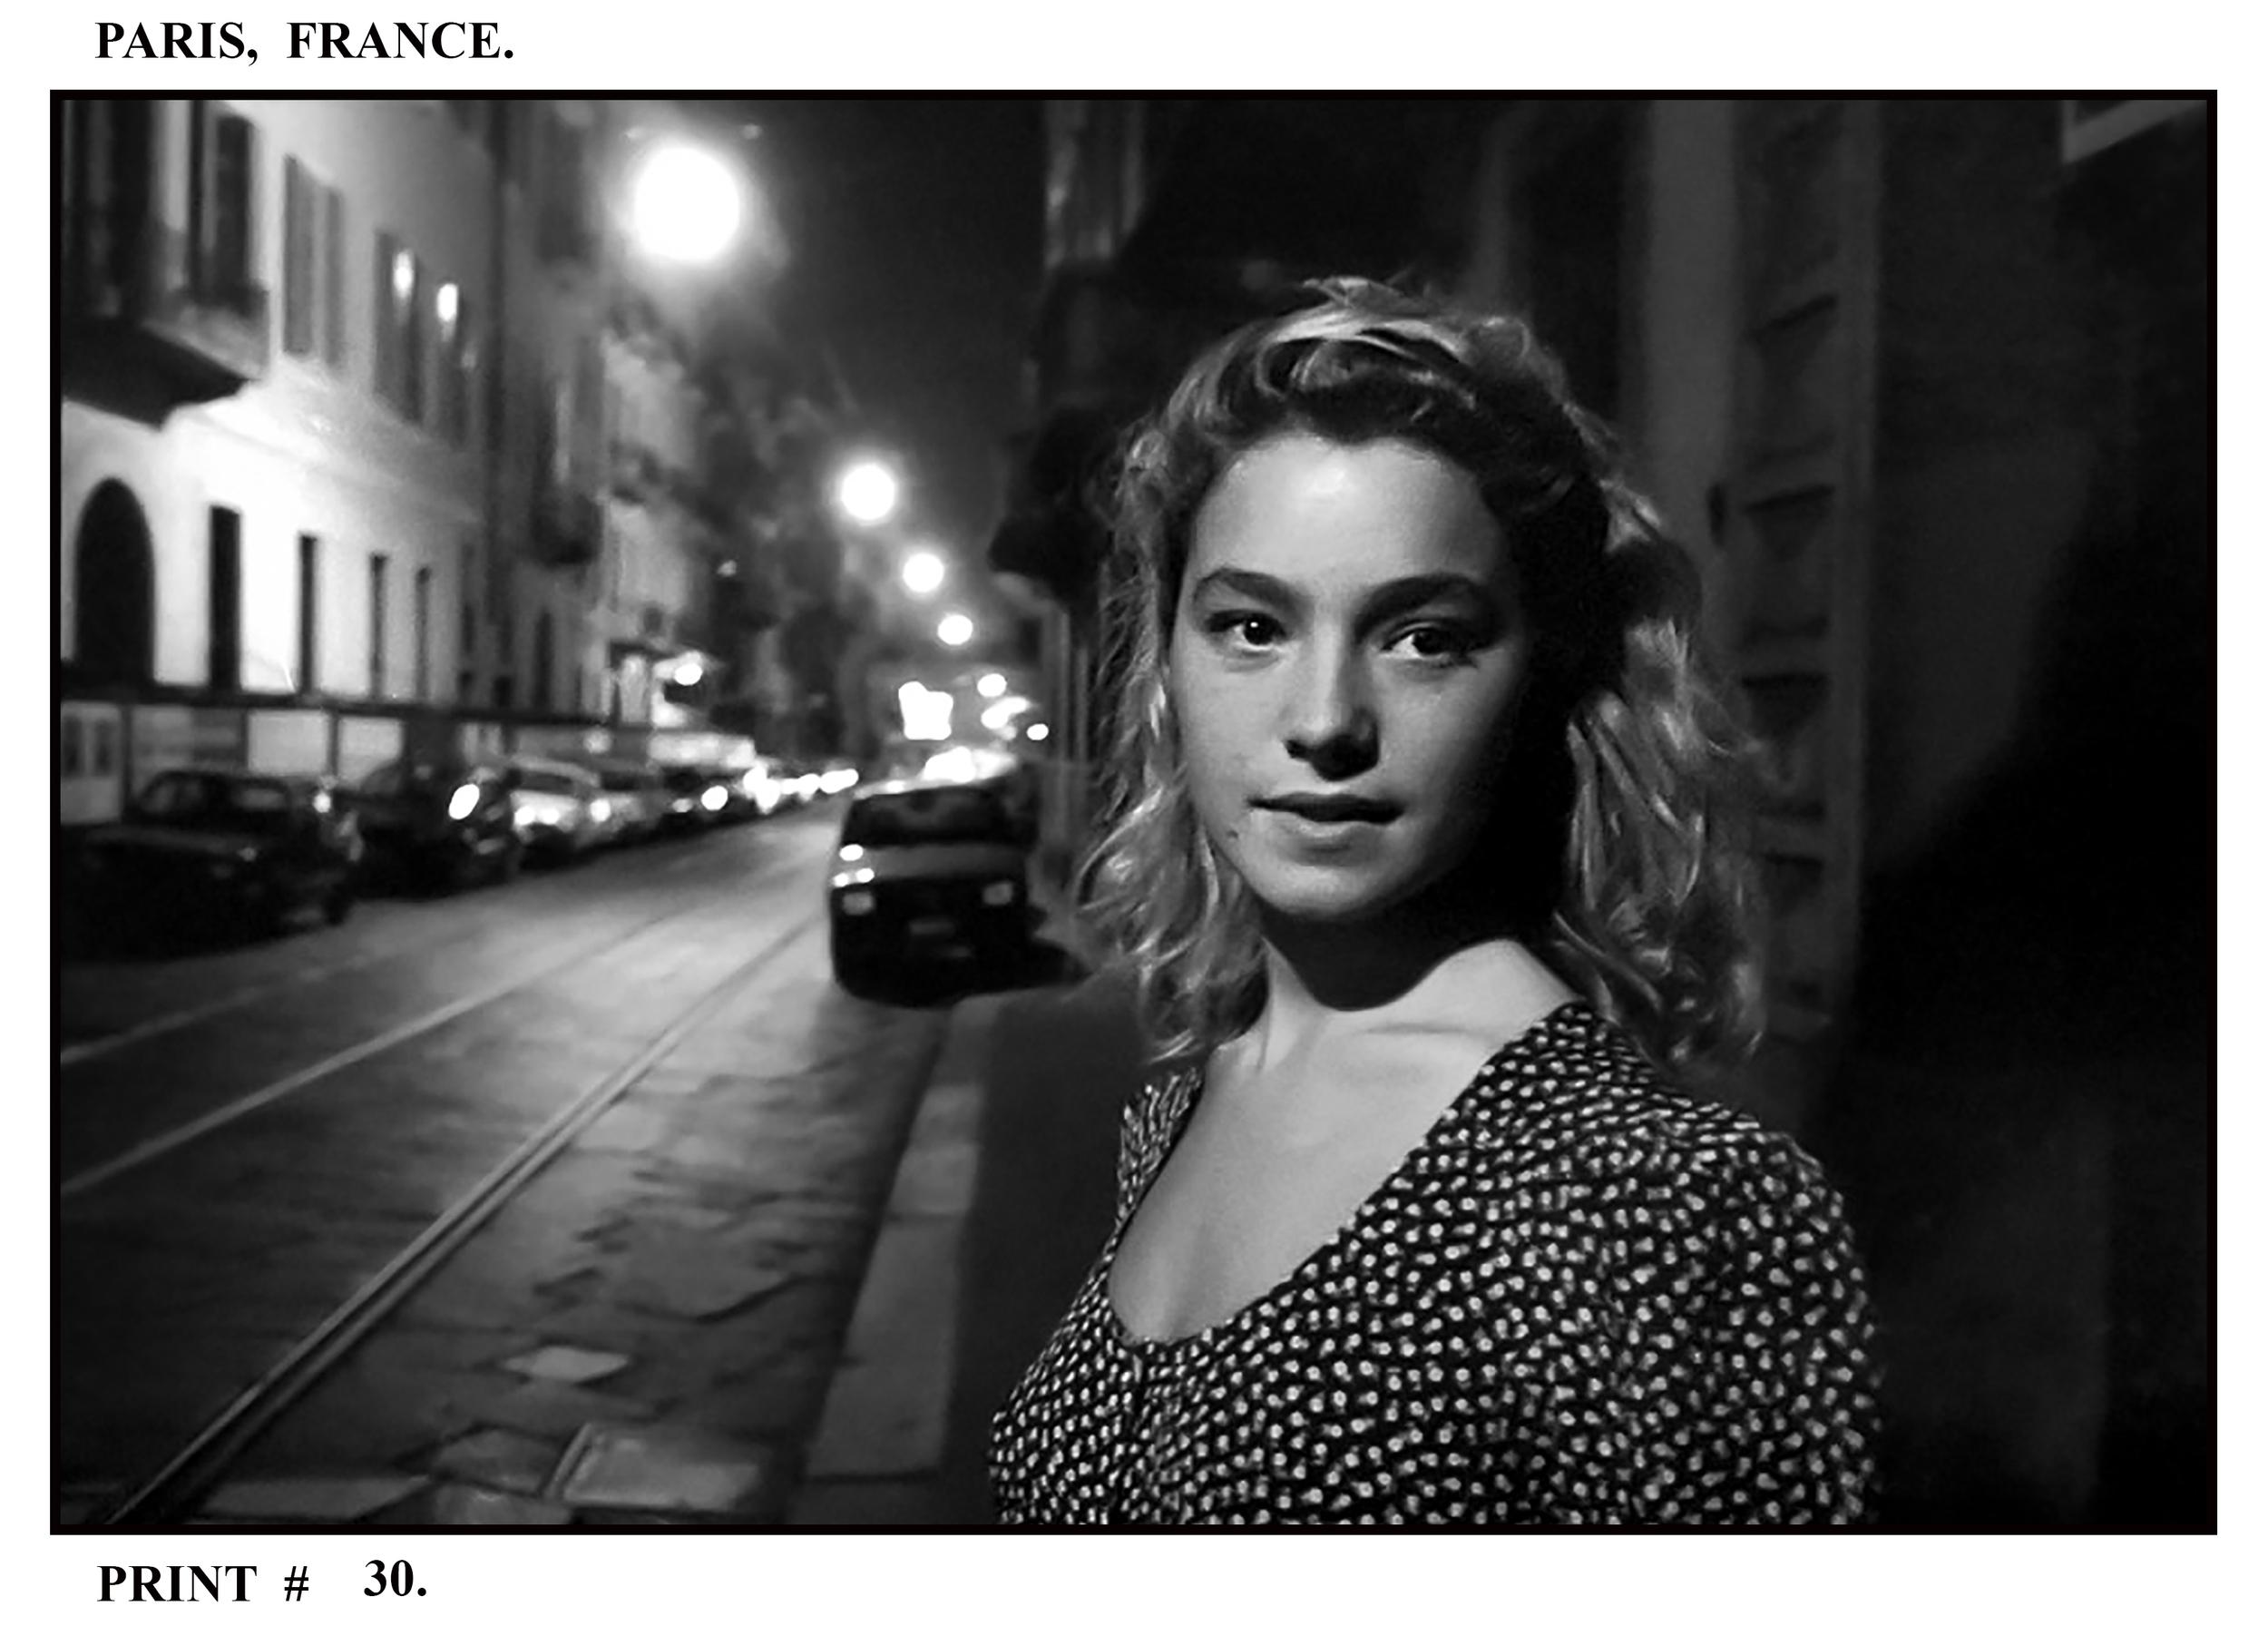 030PARIS, FRANCE copy.jpg